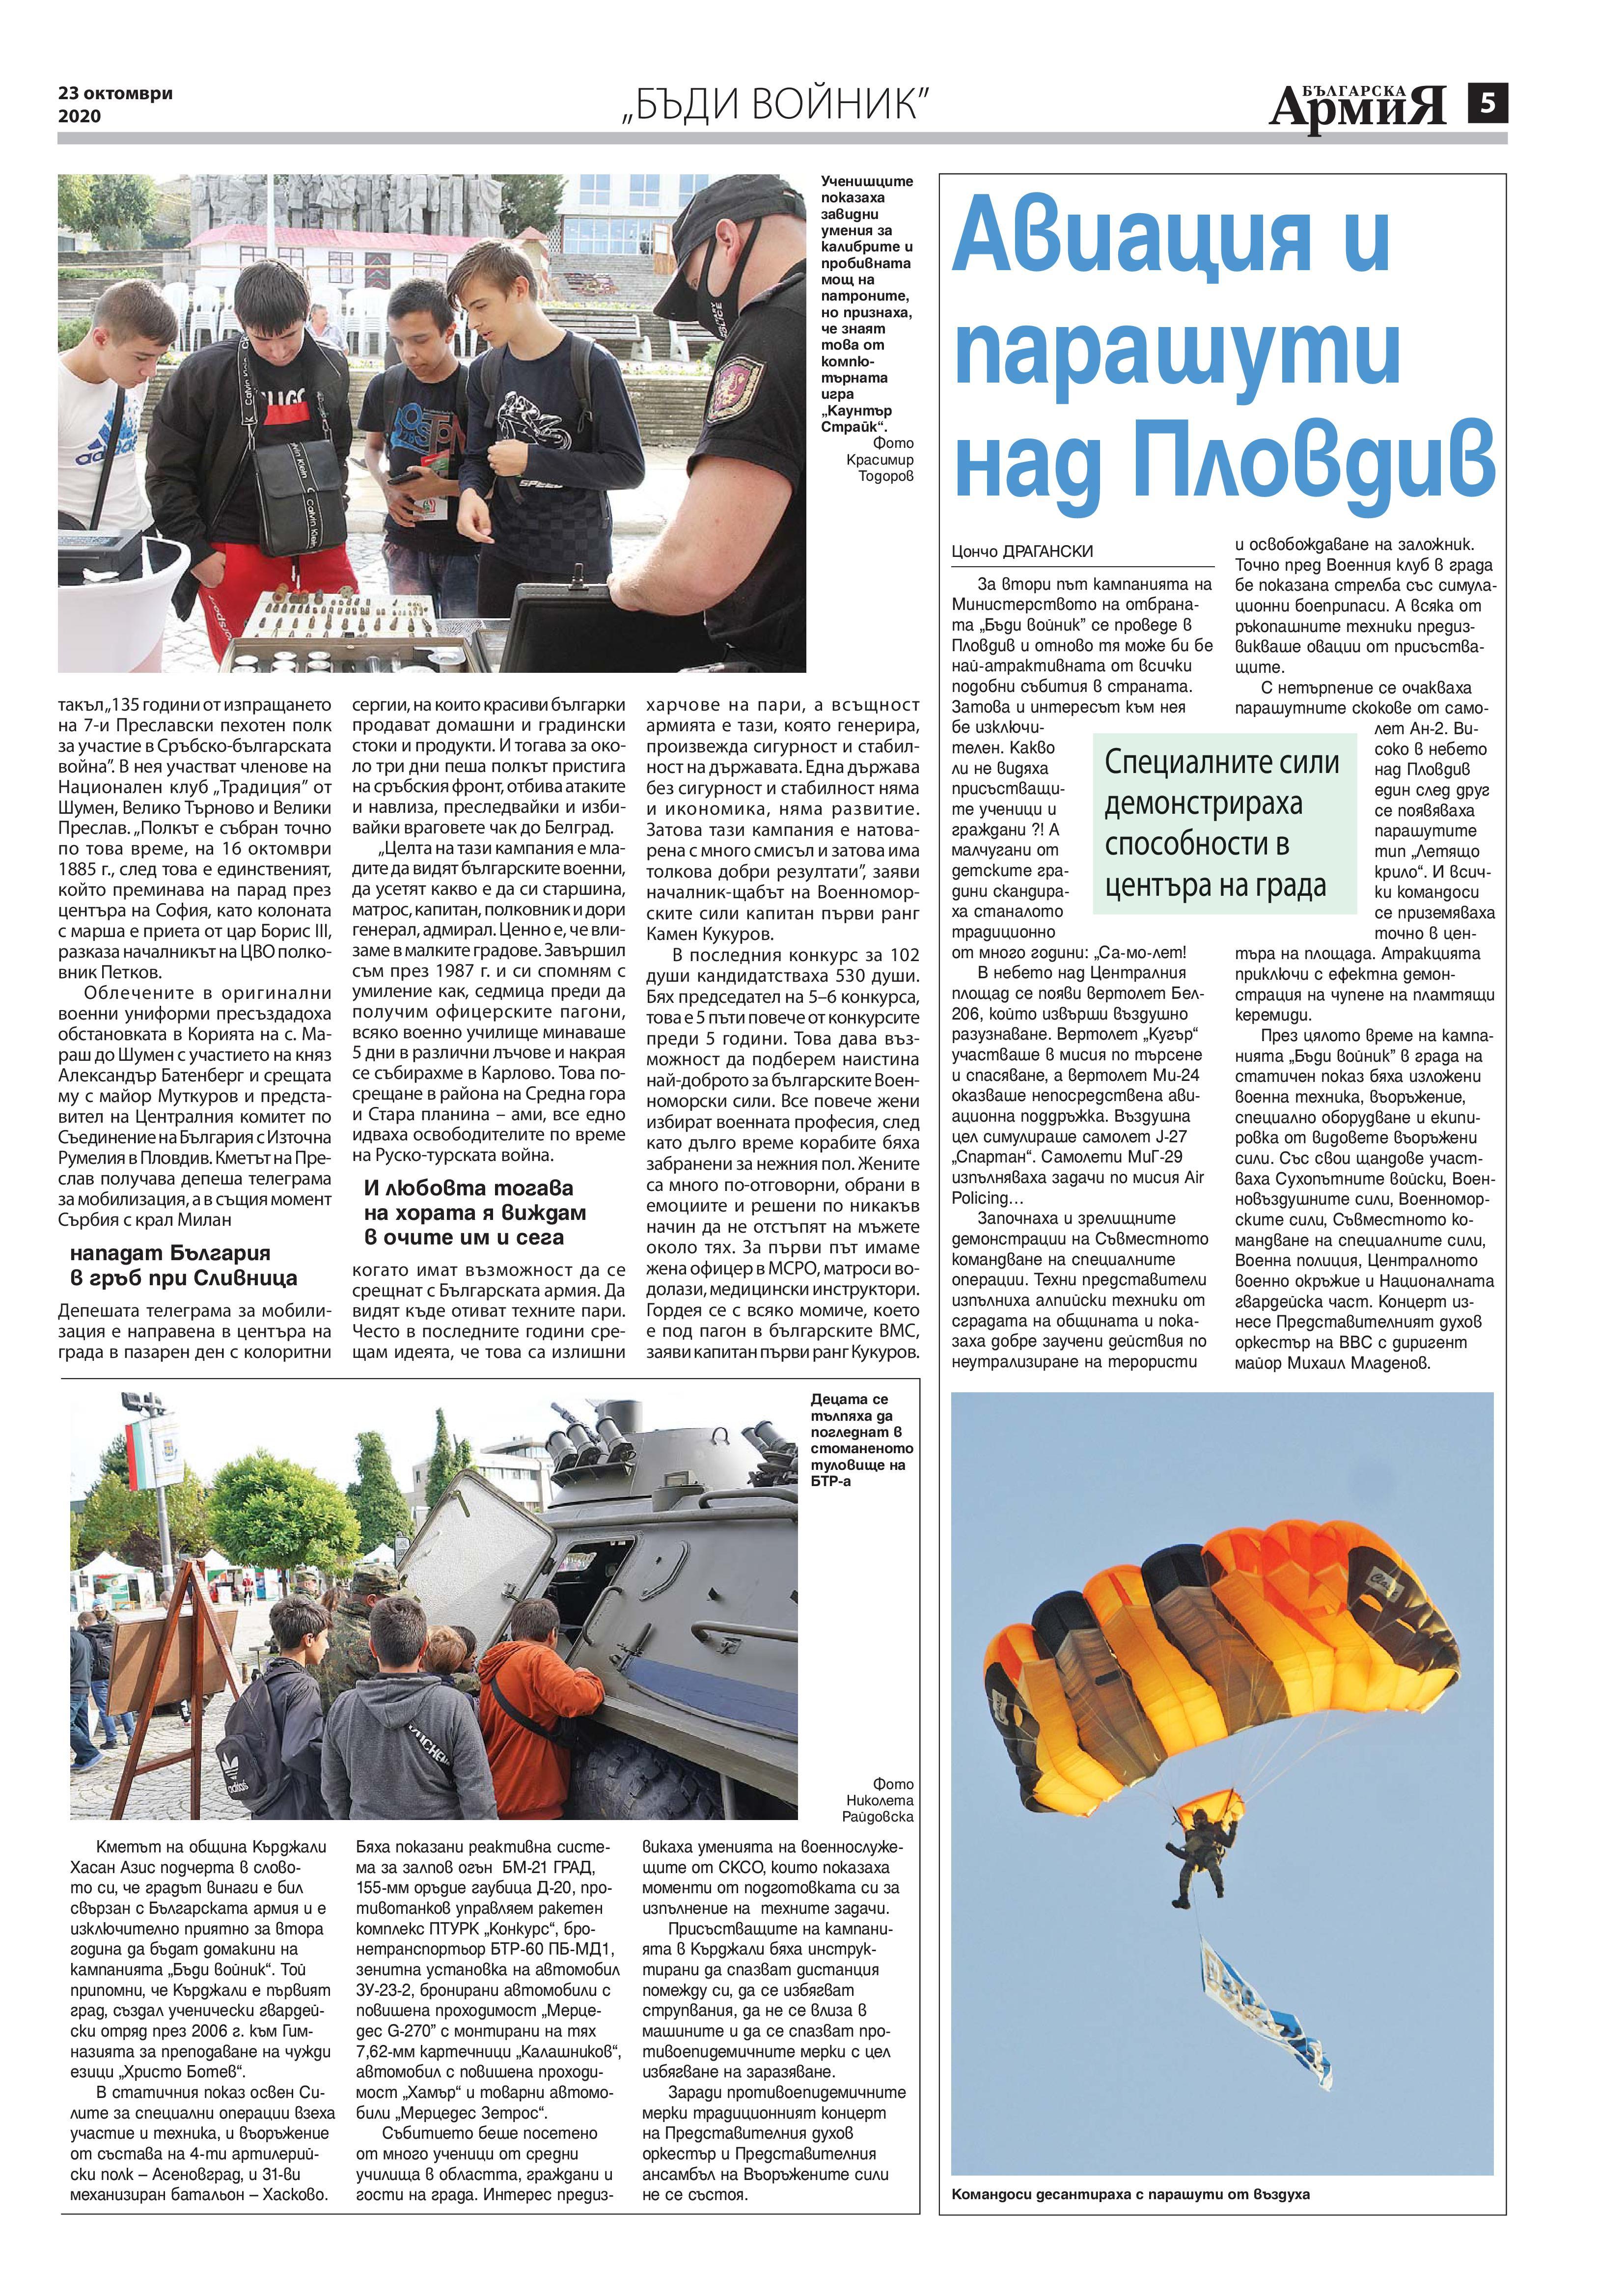 https://armymedia.bg/wp-content/uploads/2015/06/05-44.jpg